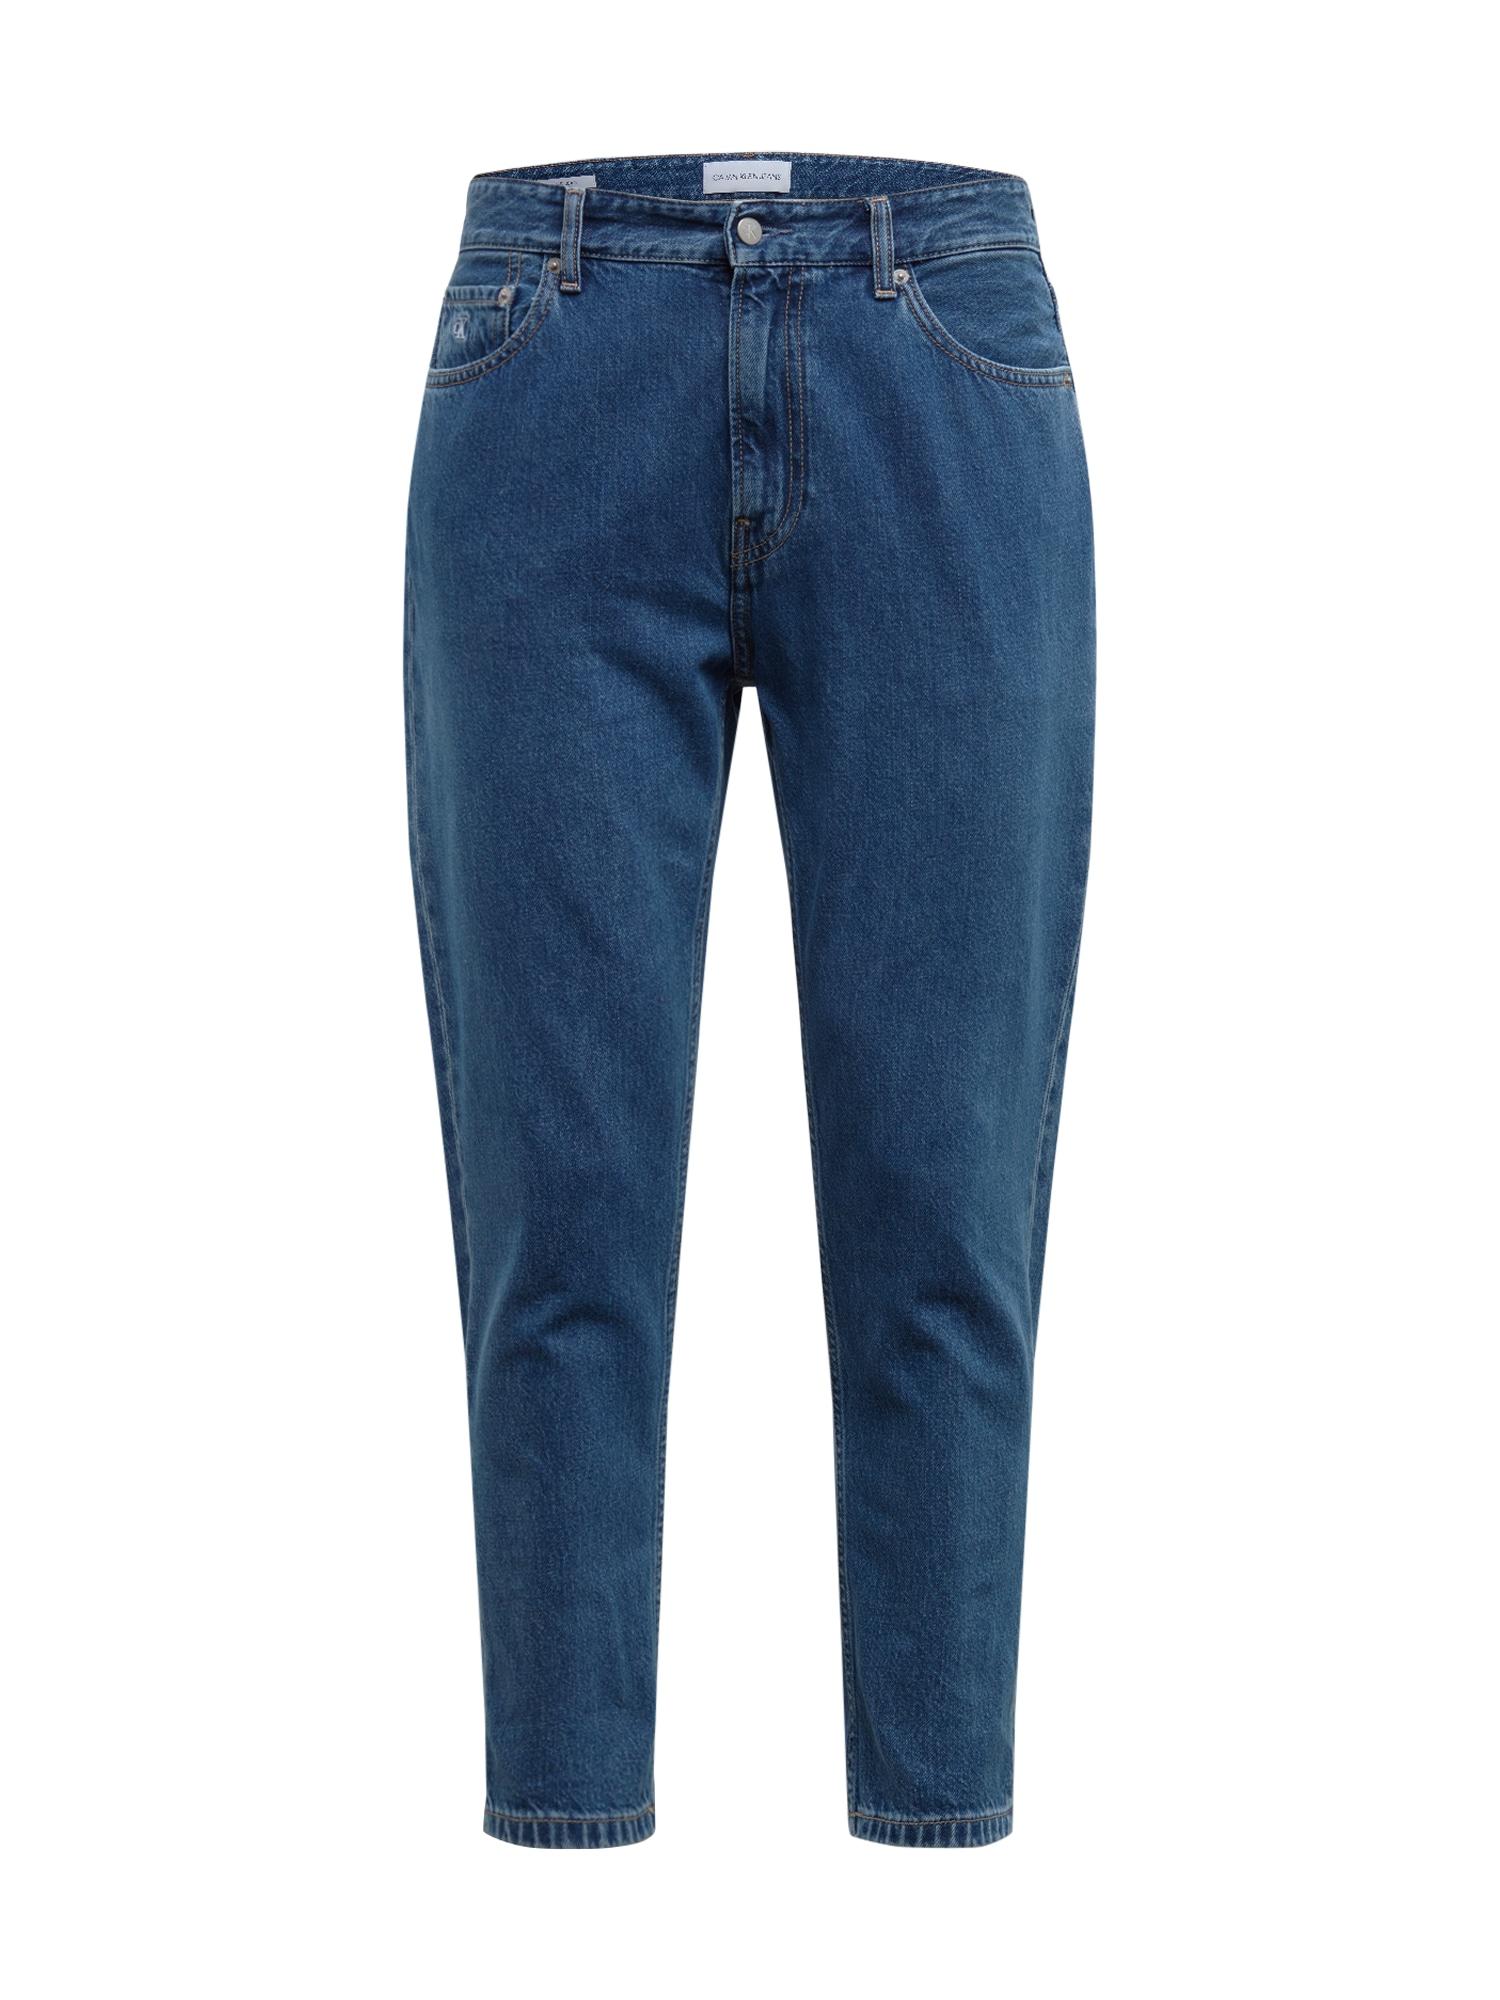 Calvin Klein Jeans Džinsai 'DAD JEAN' tamsiai (džinso) mėlyna